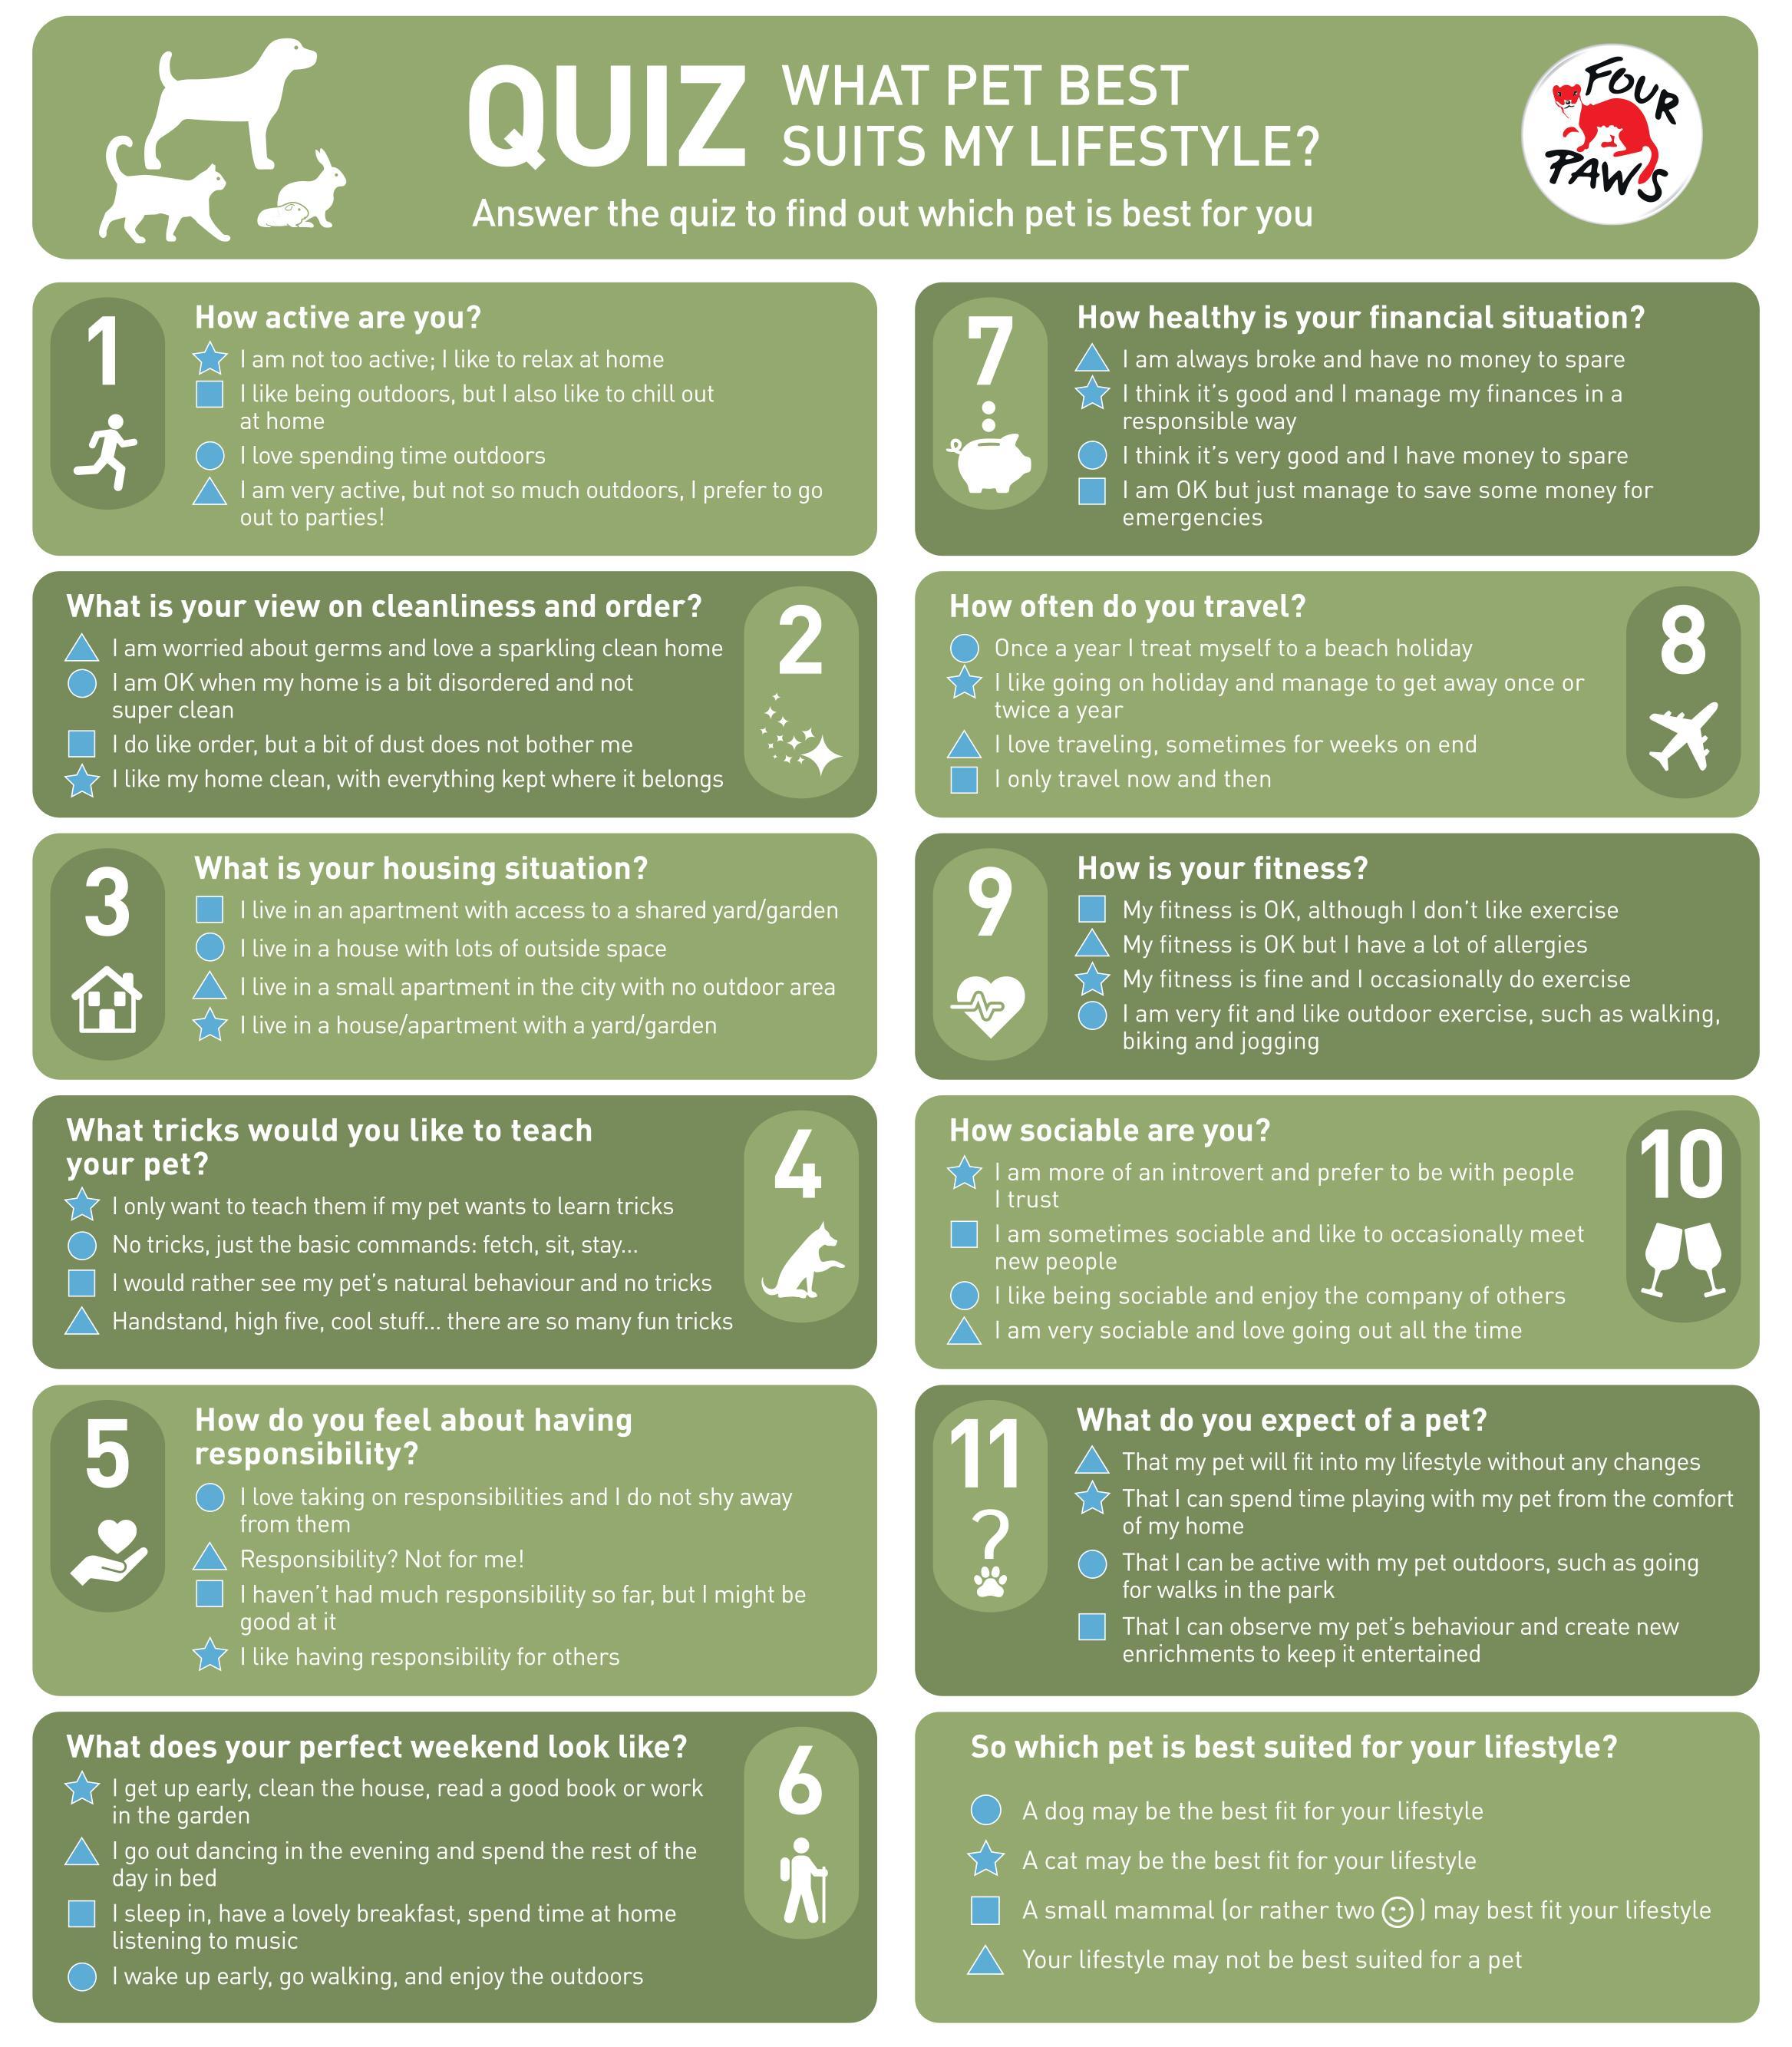 FOUR PAWS quiz 'What pet best suits my lifestyle?'